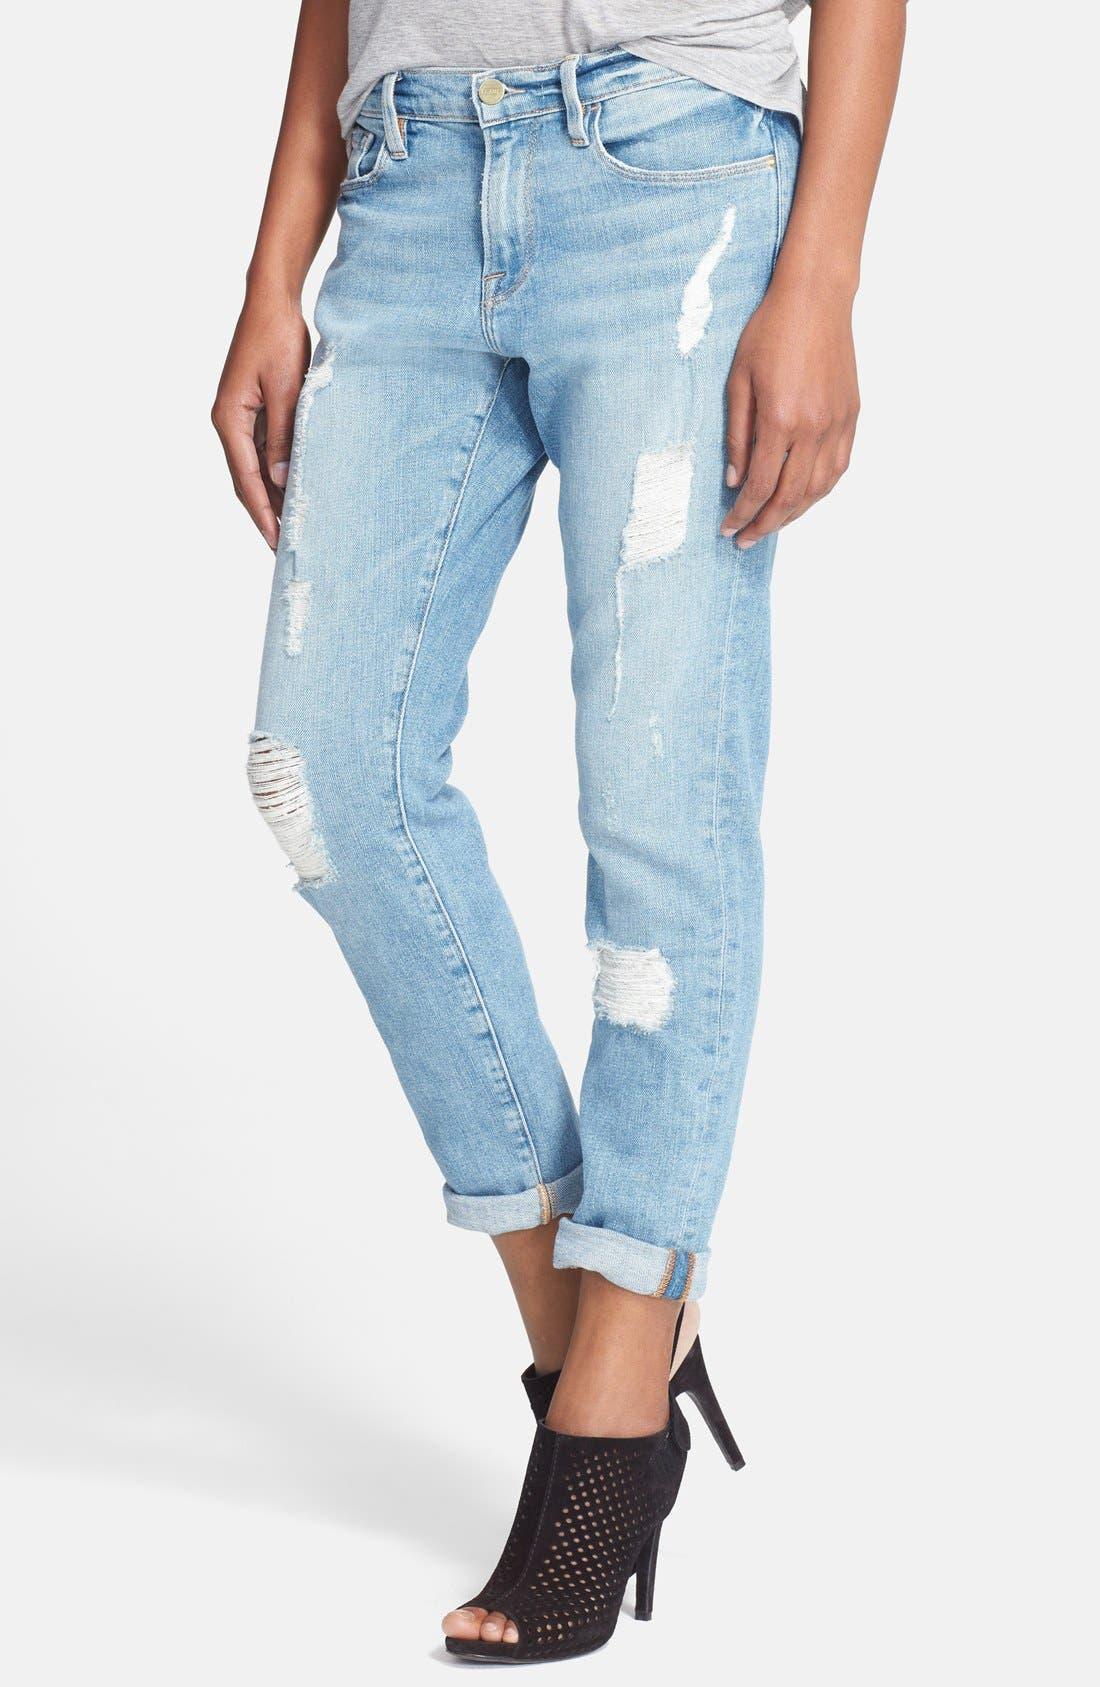 Main Image - Frame Denim 'Le Garcon' Boyfriend Jeans (Beek Street)